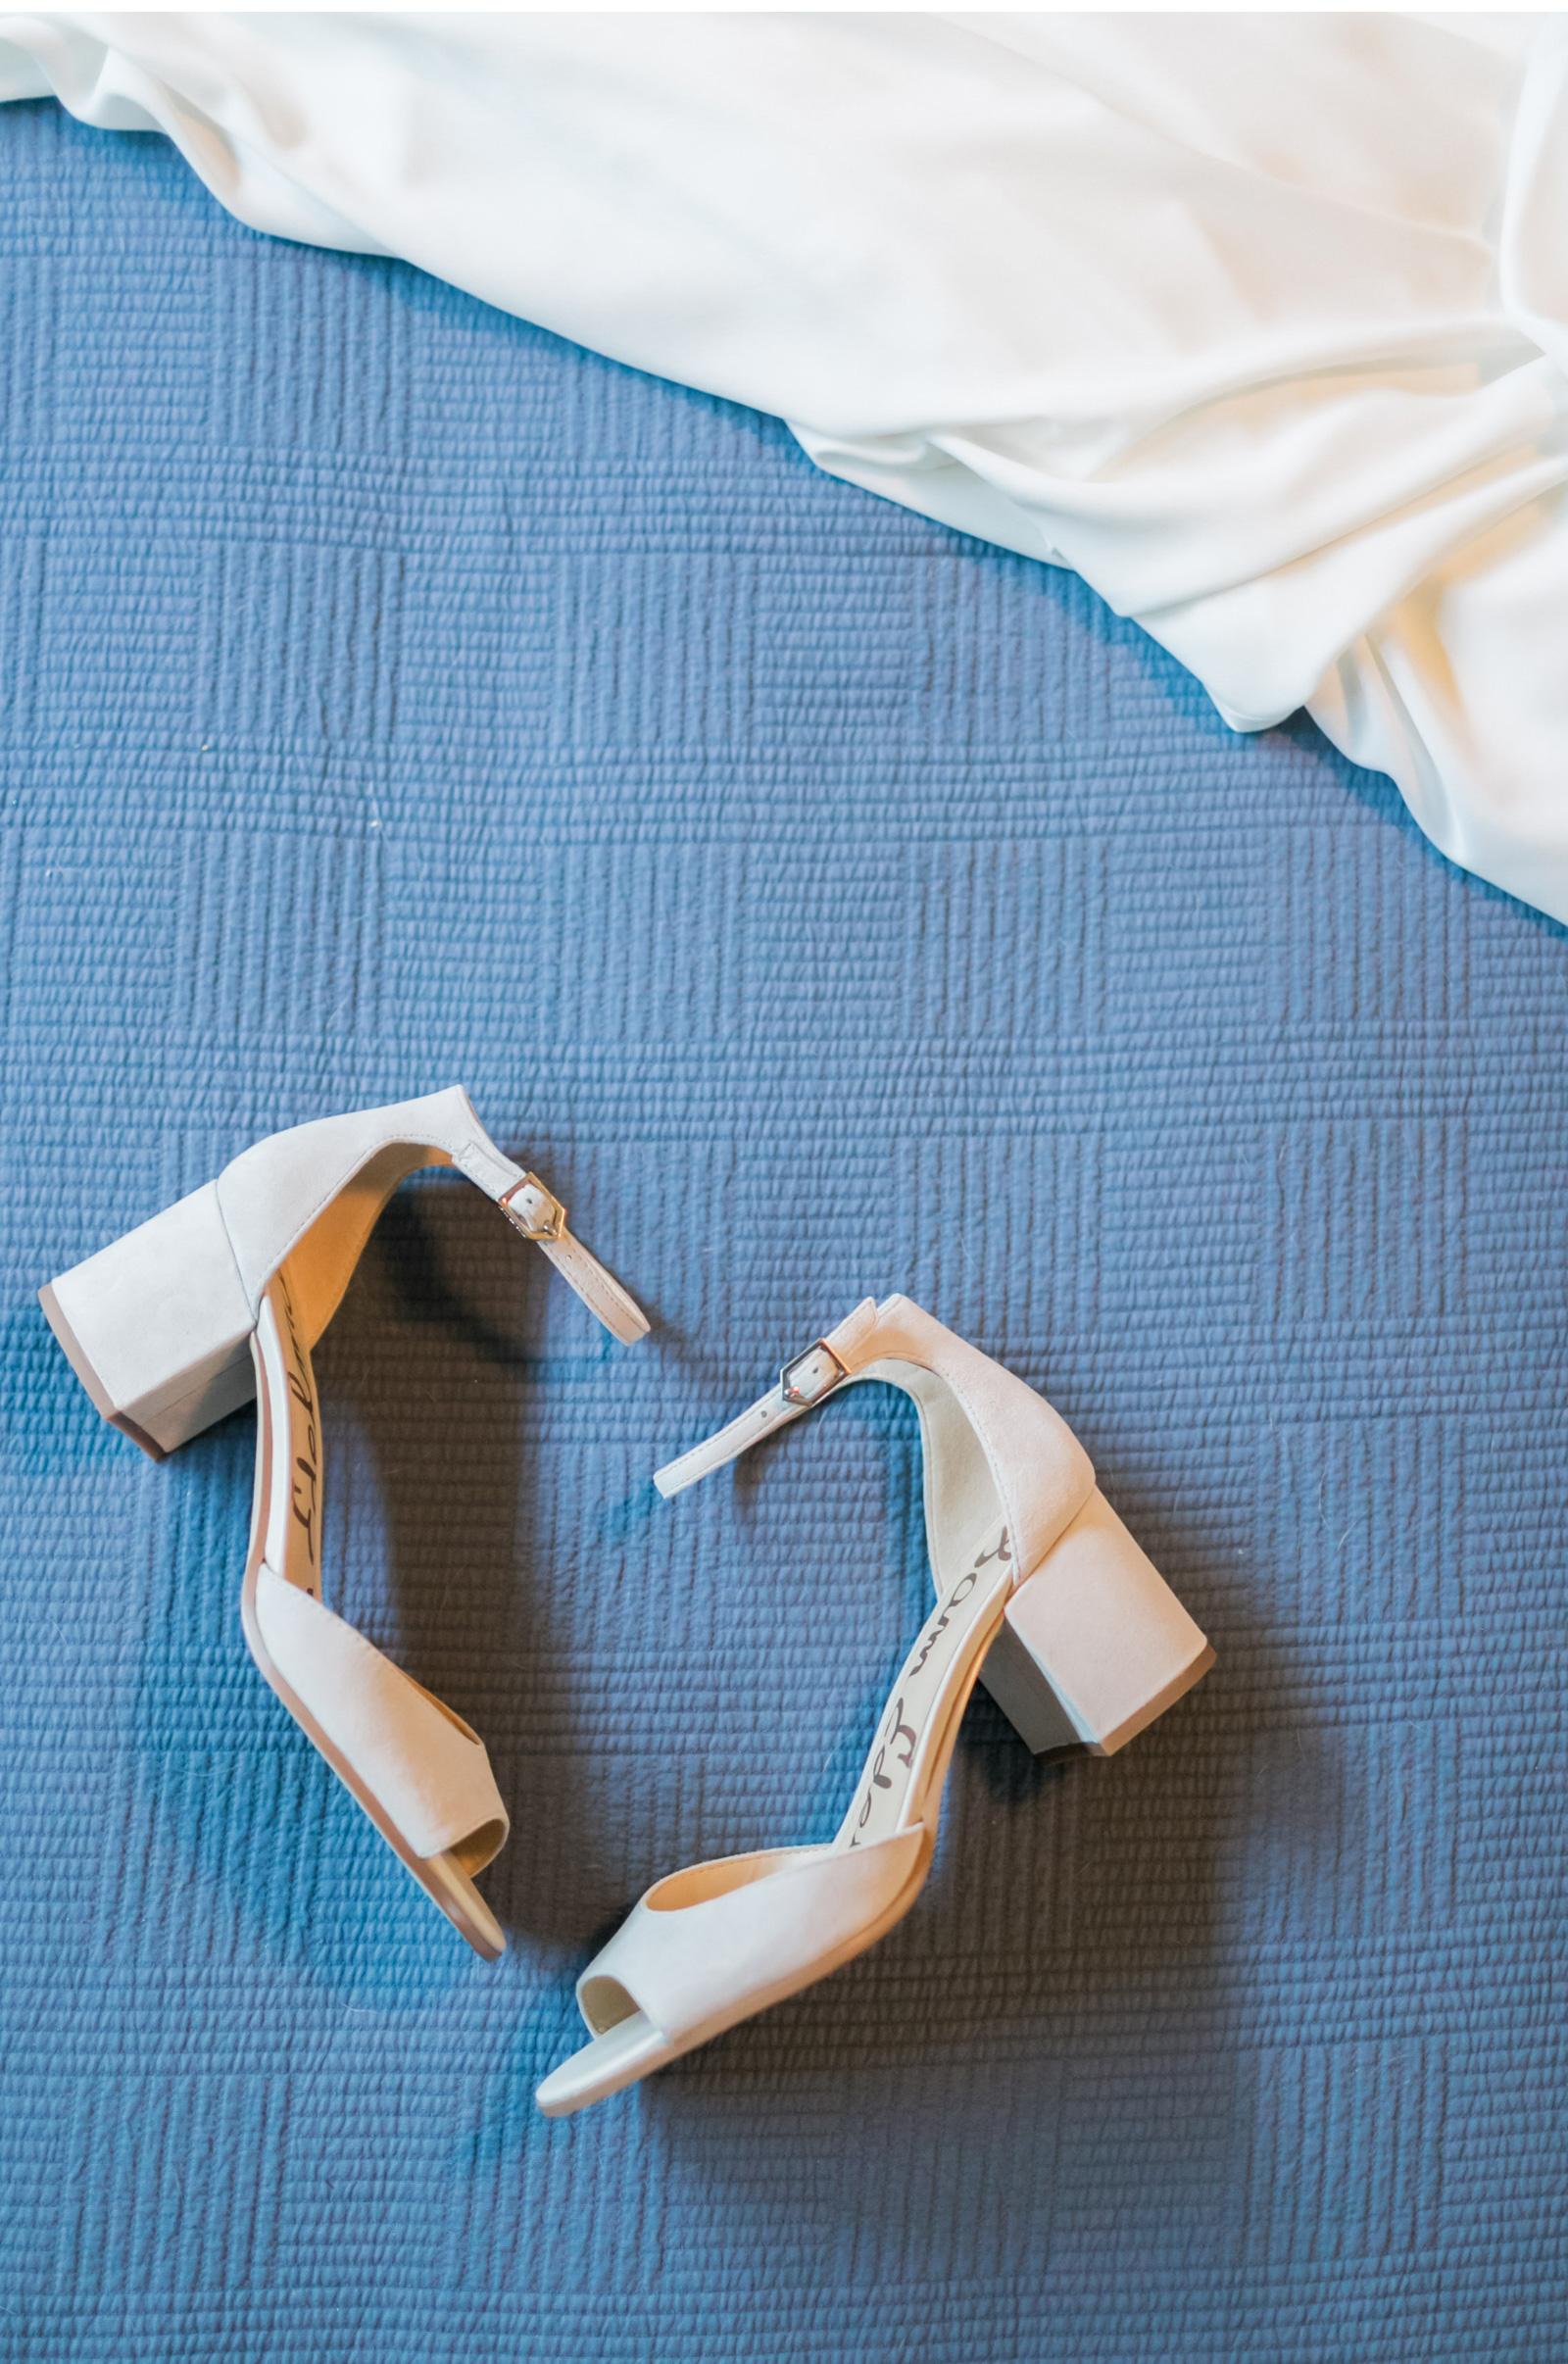 Malibu-Wedding-Photographer-Natalie-Schutt-Photography-Fine-Art-Film-Photography_01.jpg